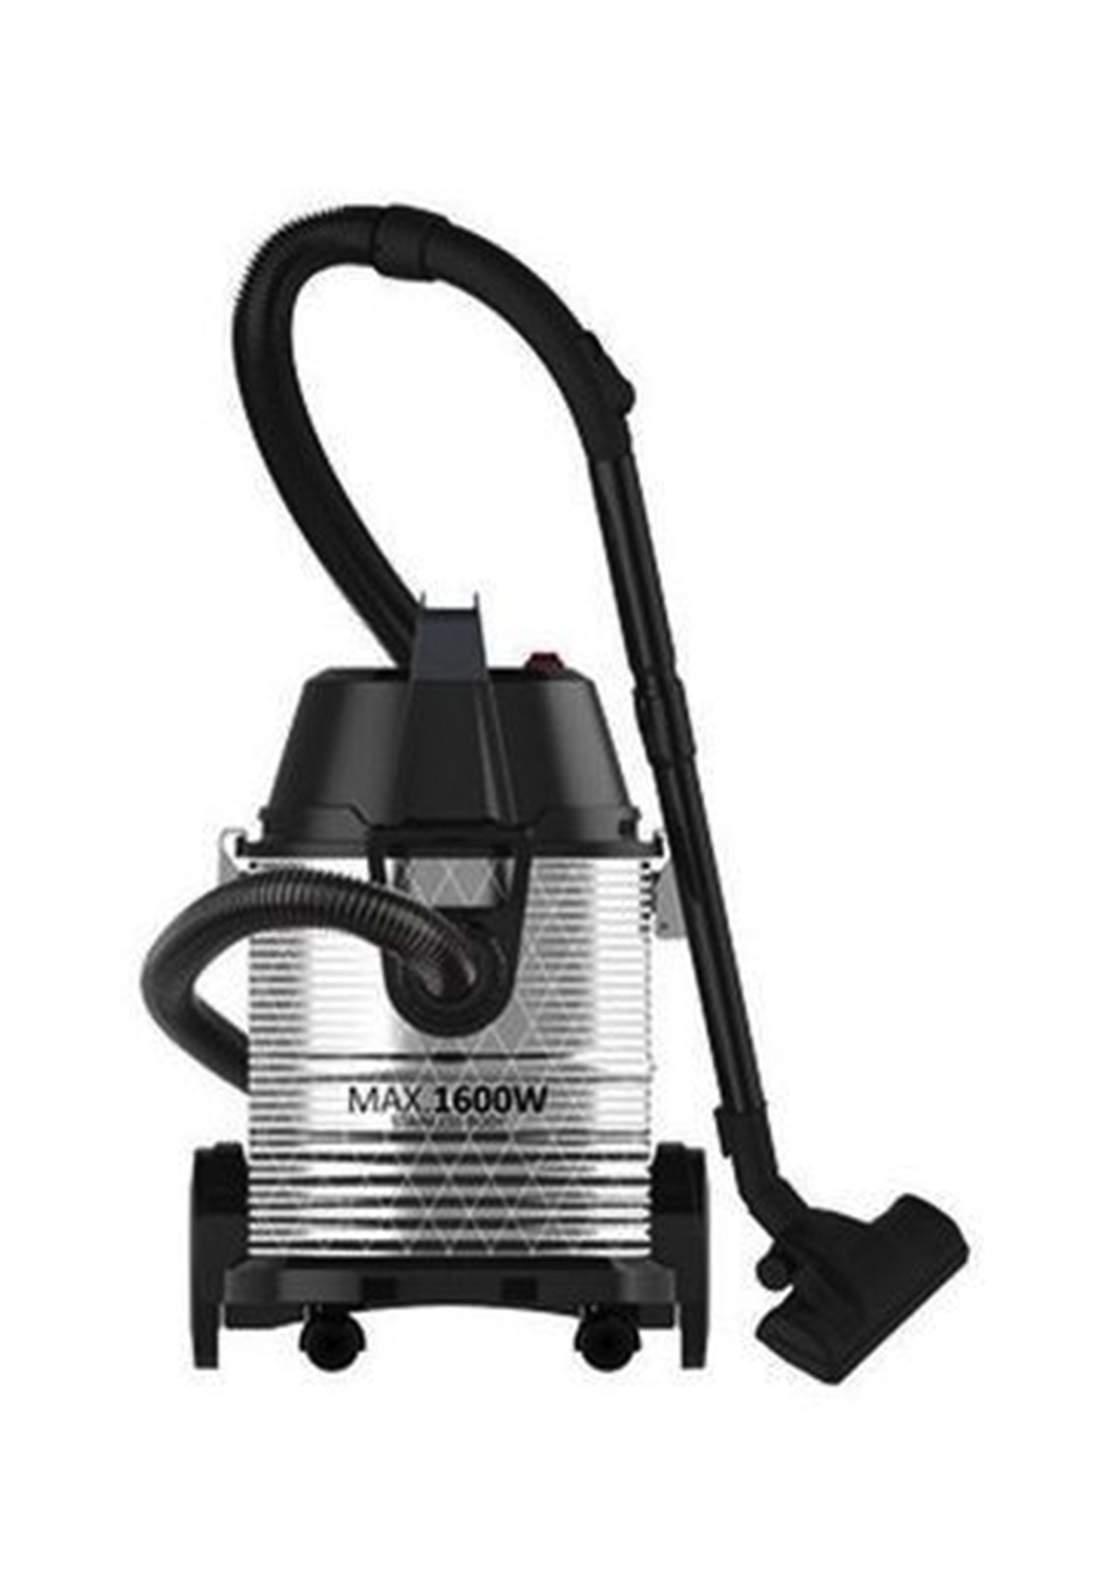 Denka NO-8400VCWD Drum Vacuum Cleaner - 1600 Watt  مكنسة